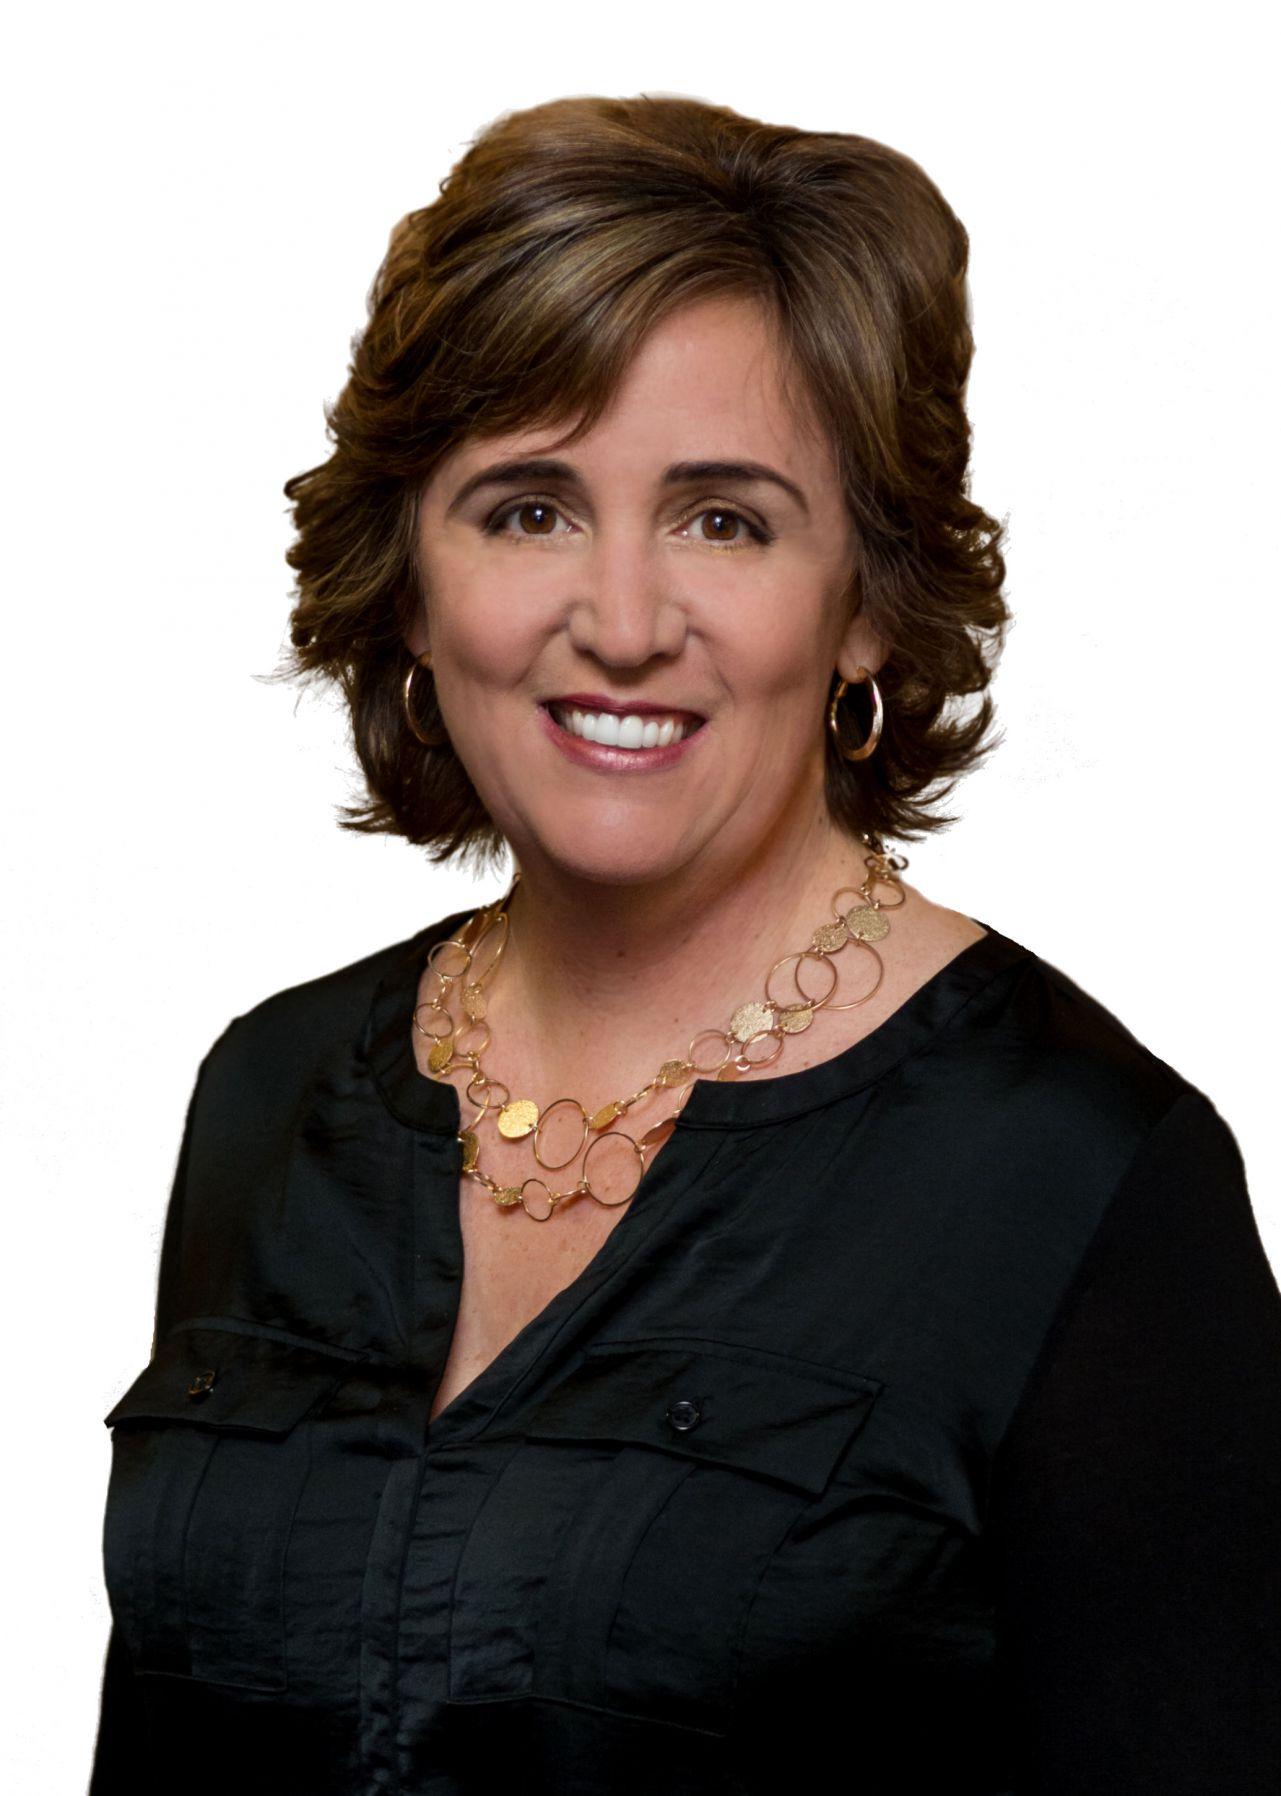 Kim Perrotti - The Kim Perrotti Team - Leading Edge Real Estate